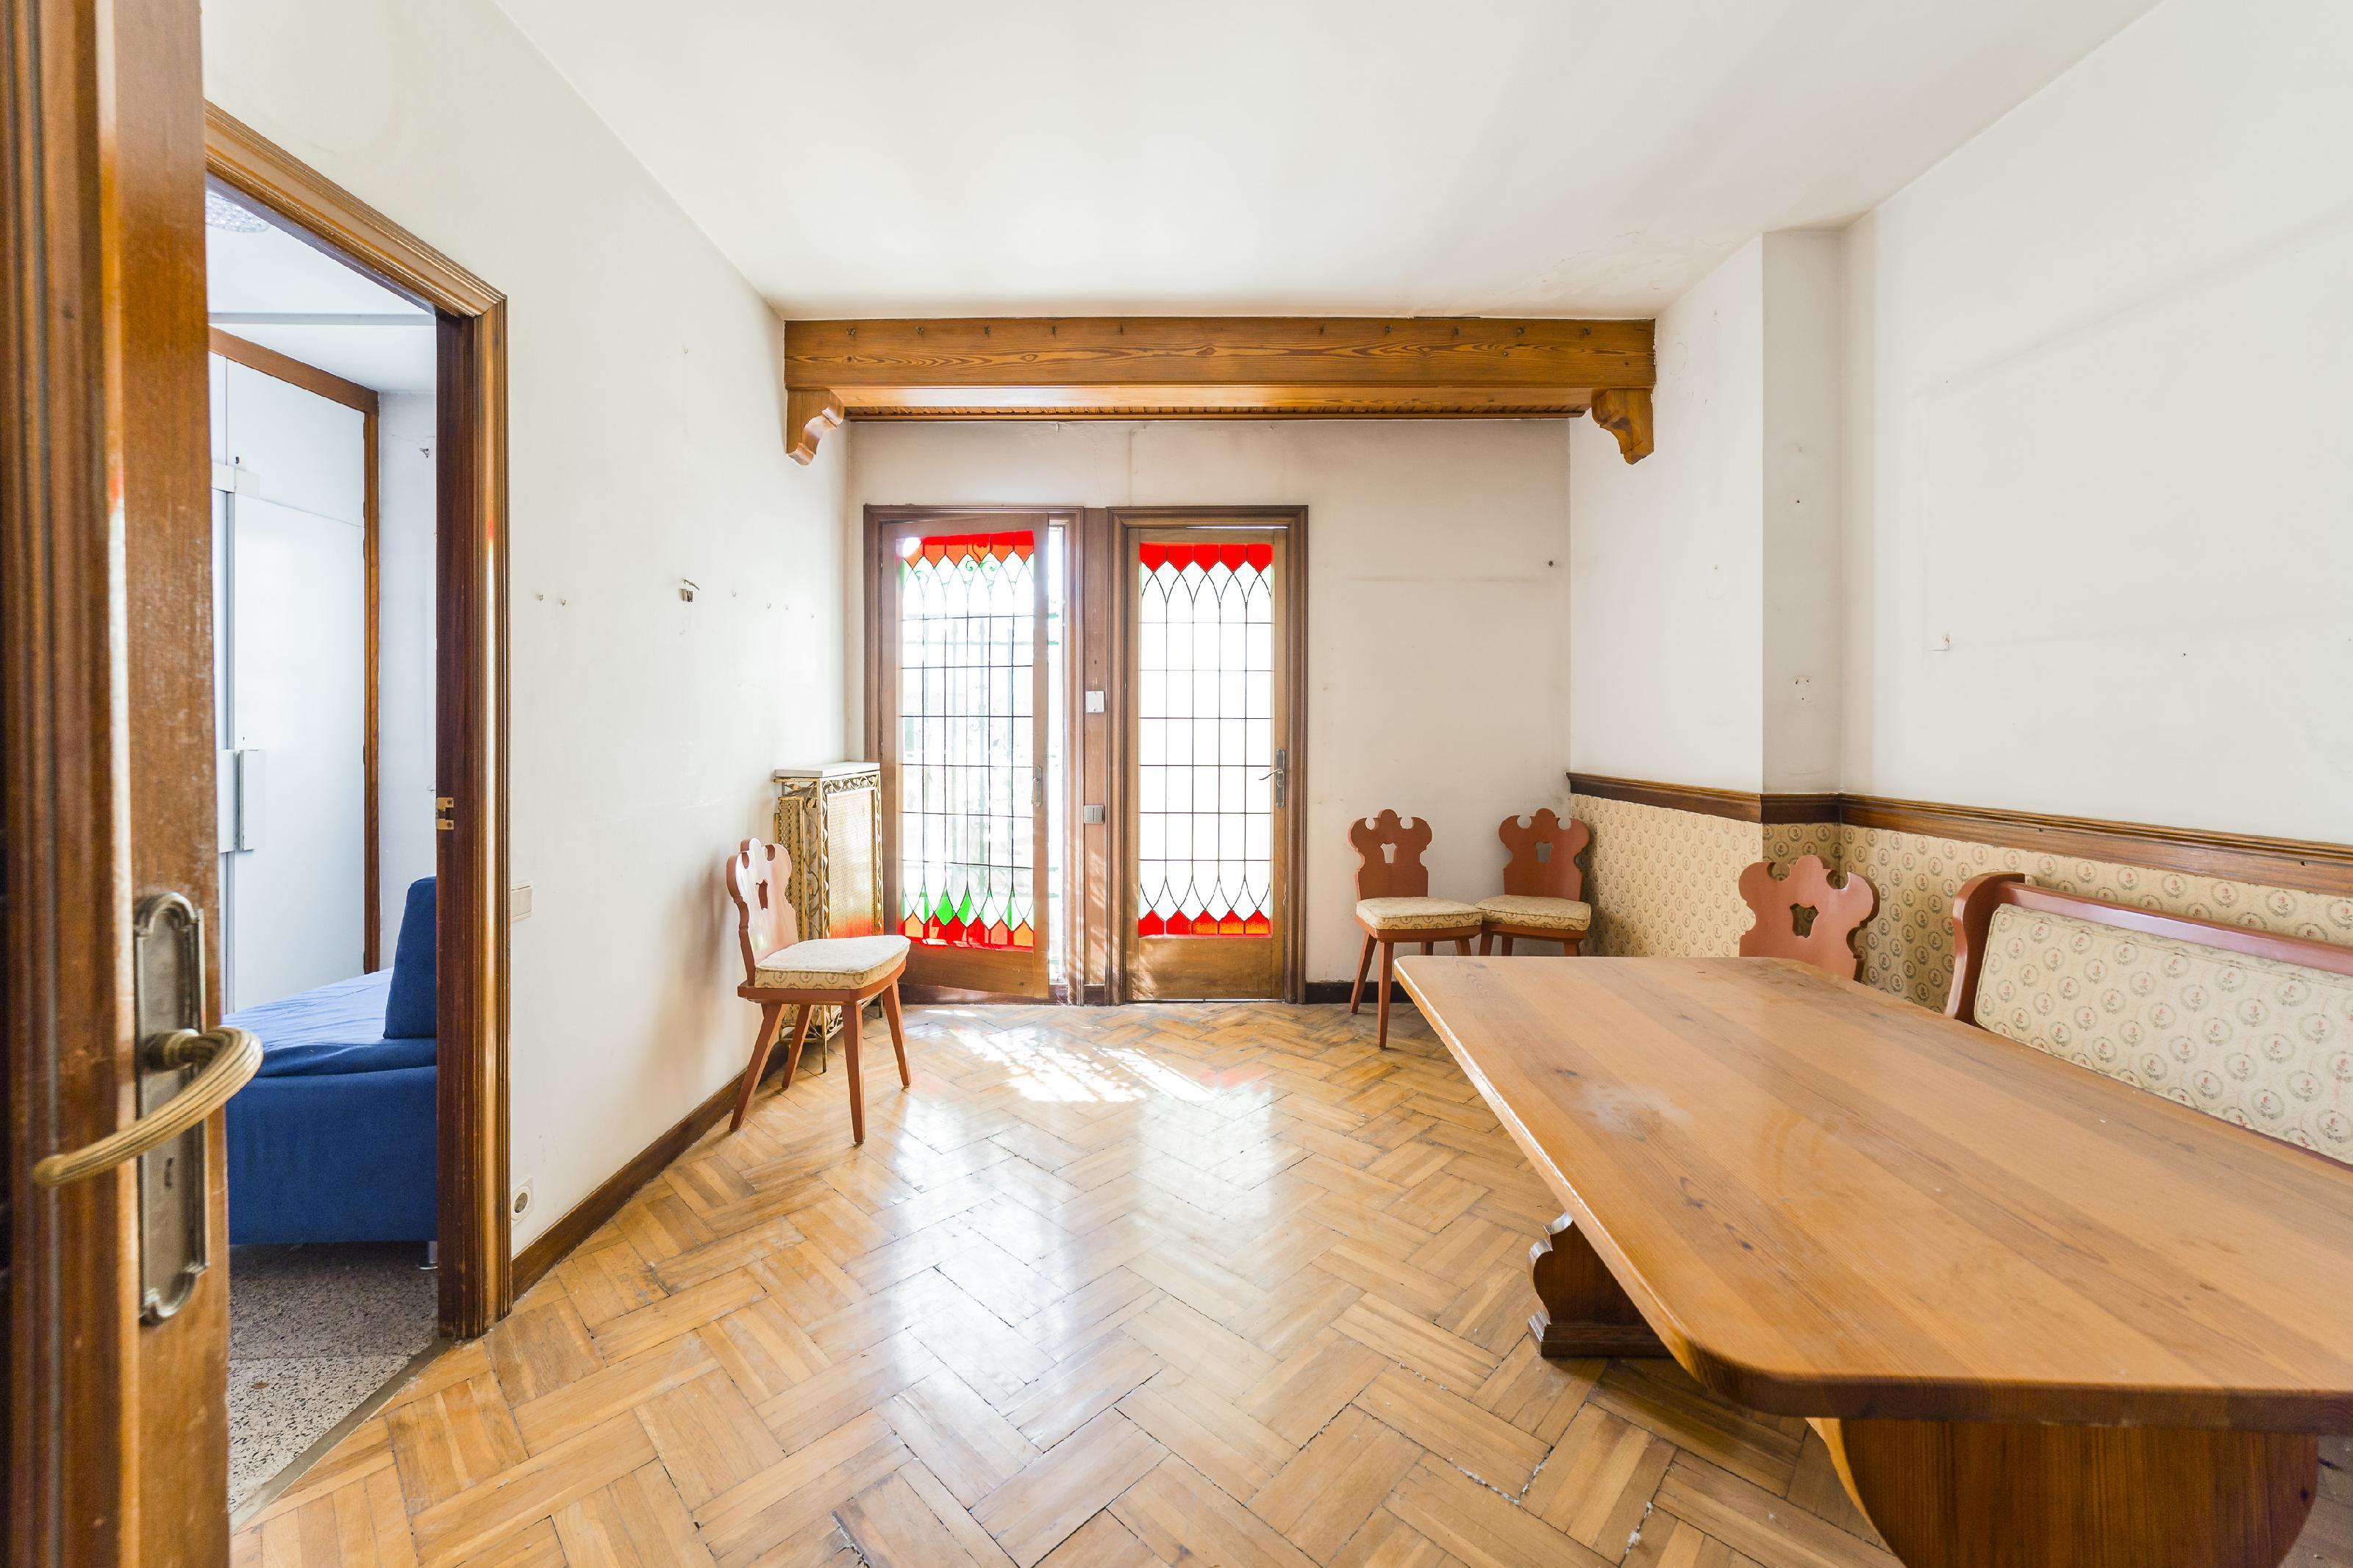 249314 Penthouse for sale in Sarrià-Sant Gervasi, Sant Gervasi-Galvany 11